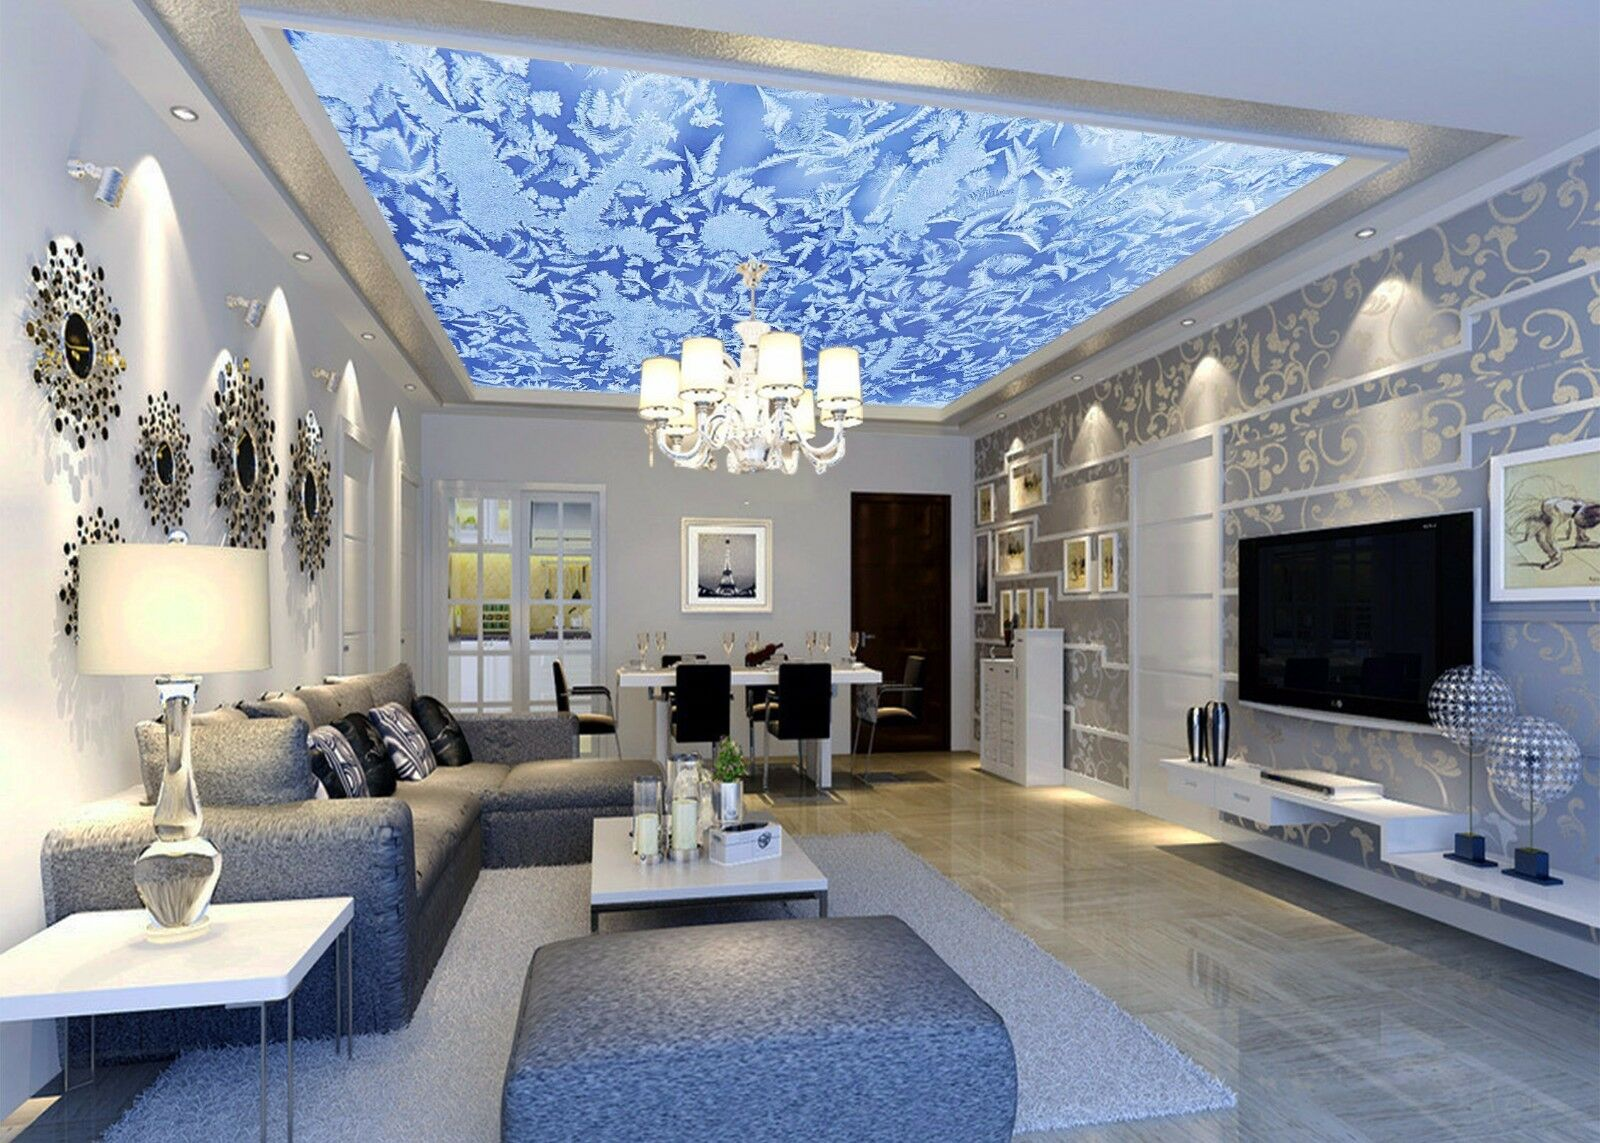 3D Snowflake 754 Ceiling WallPaper Murals Wall Print Decal Deco AJ WALLPAPER GB